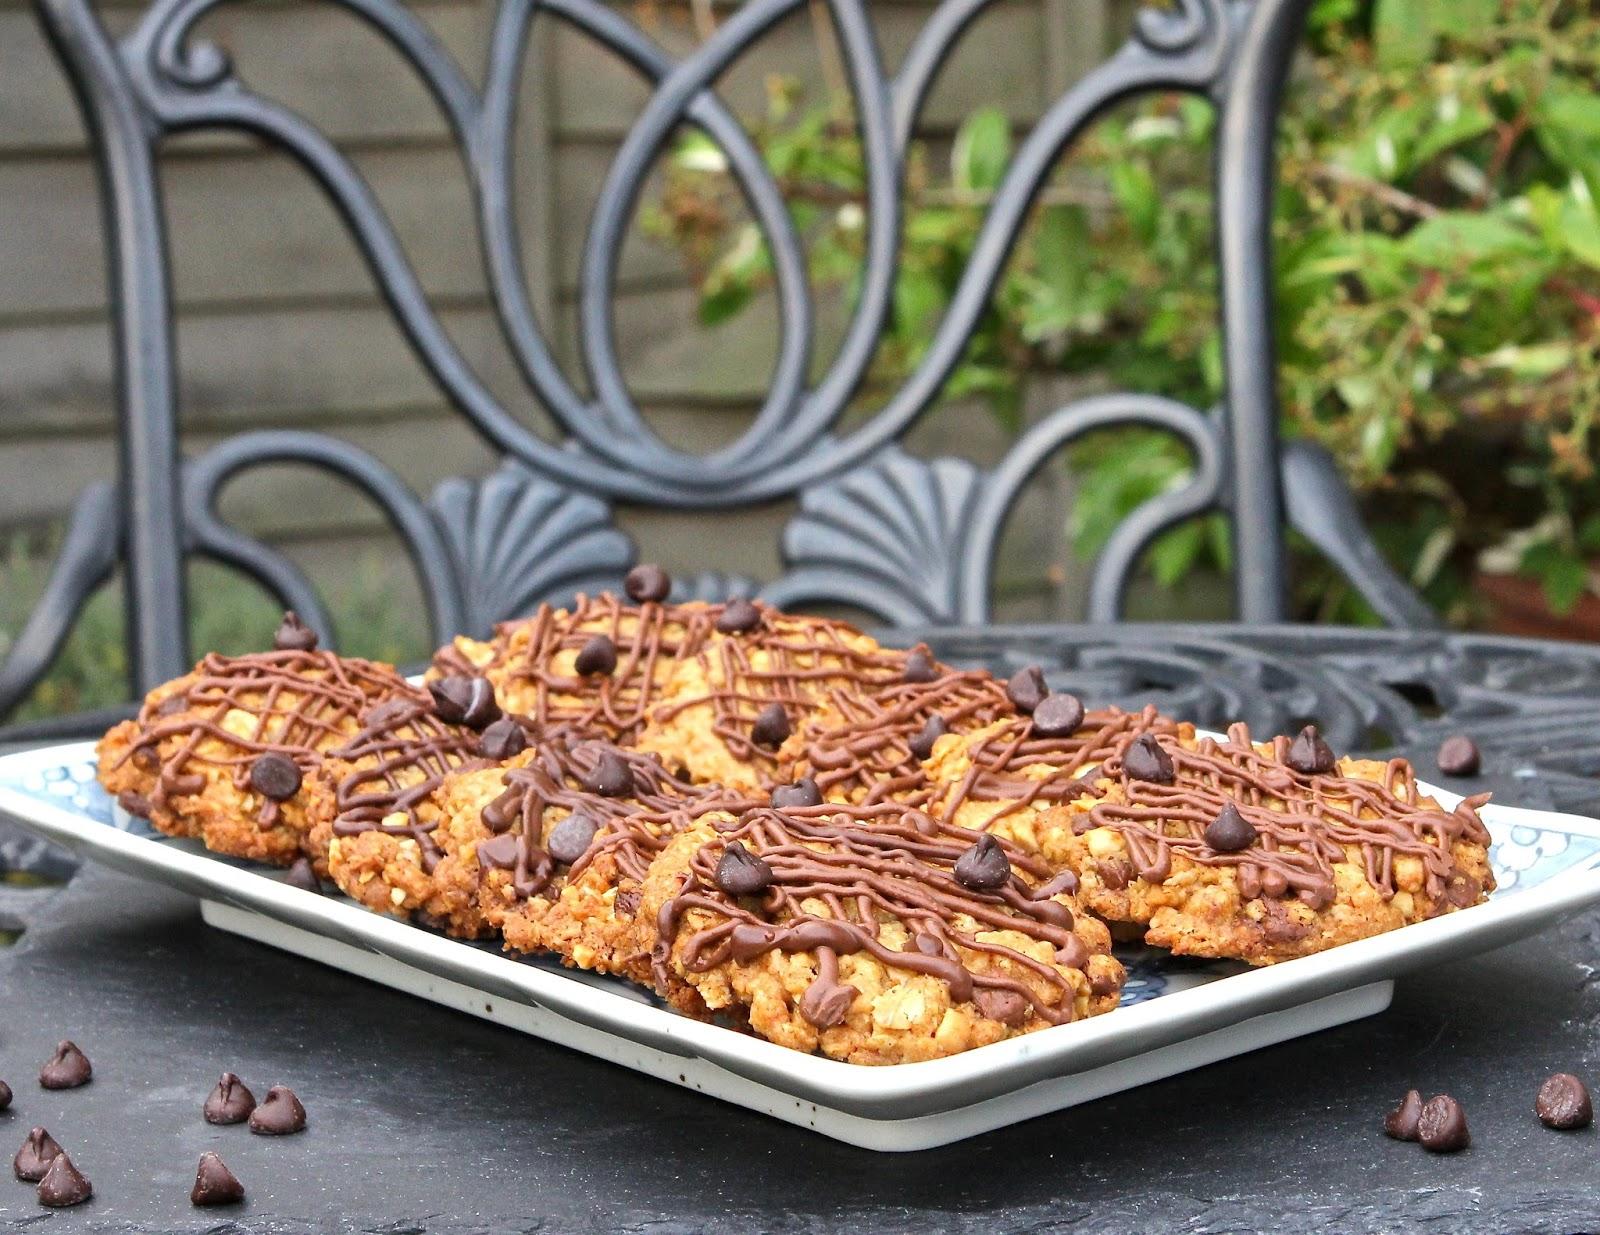 Gluten Free Alchemist: Oat, Peanut & Choc Chip Cookies ...